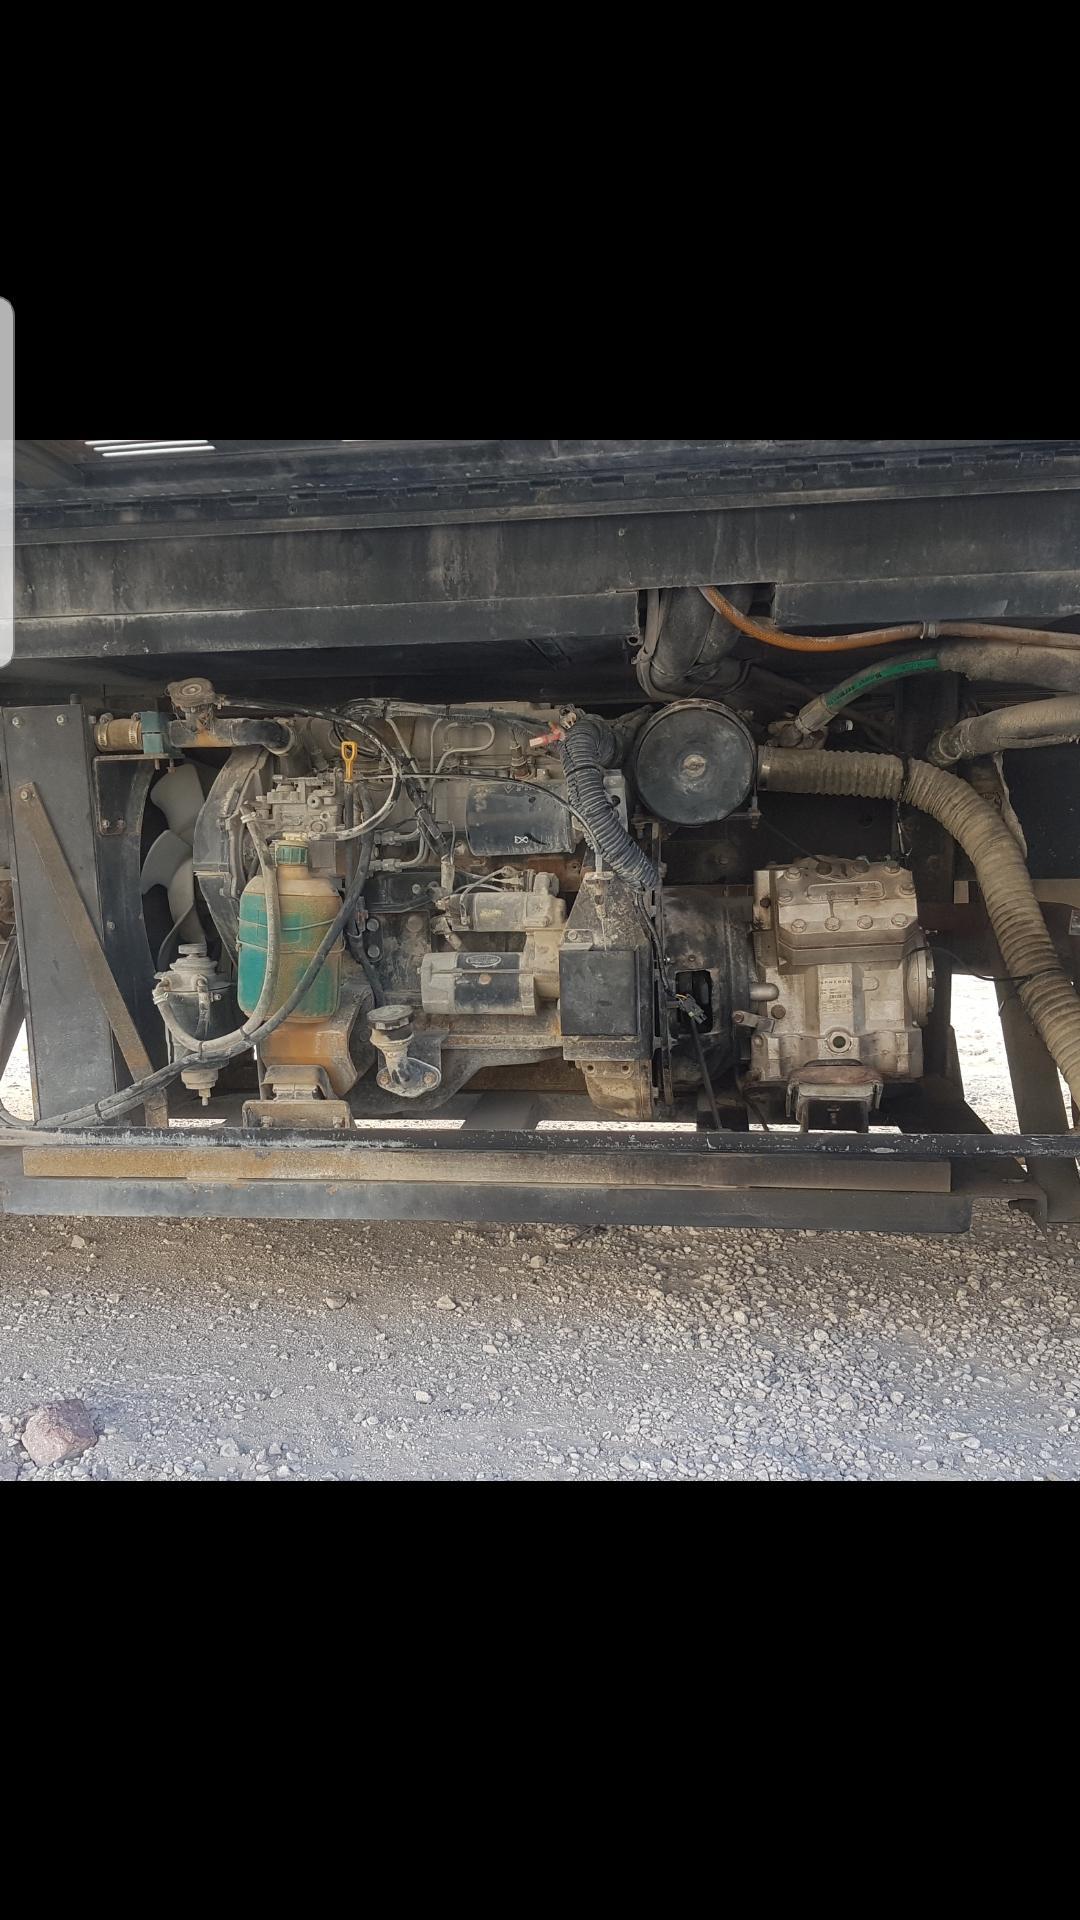 BUS AC REPAIRING